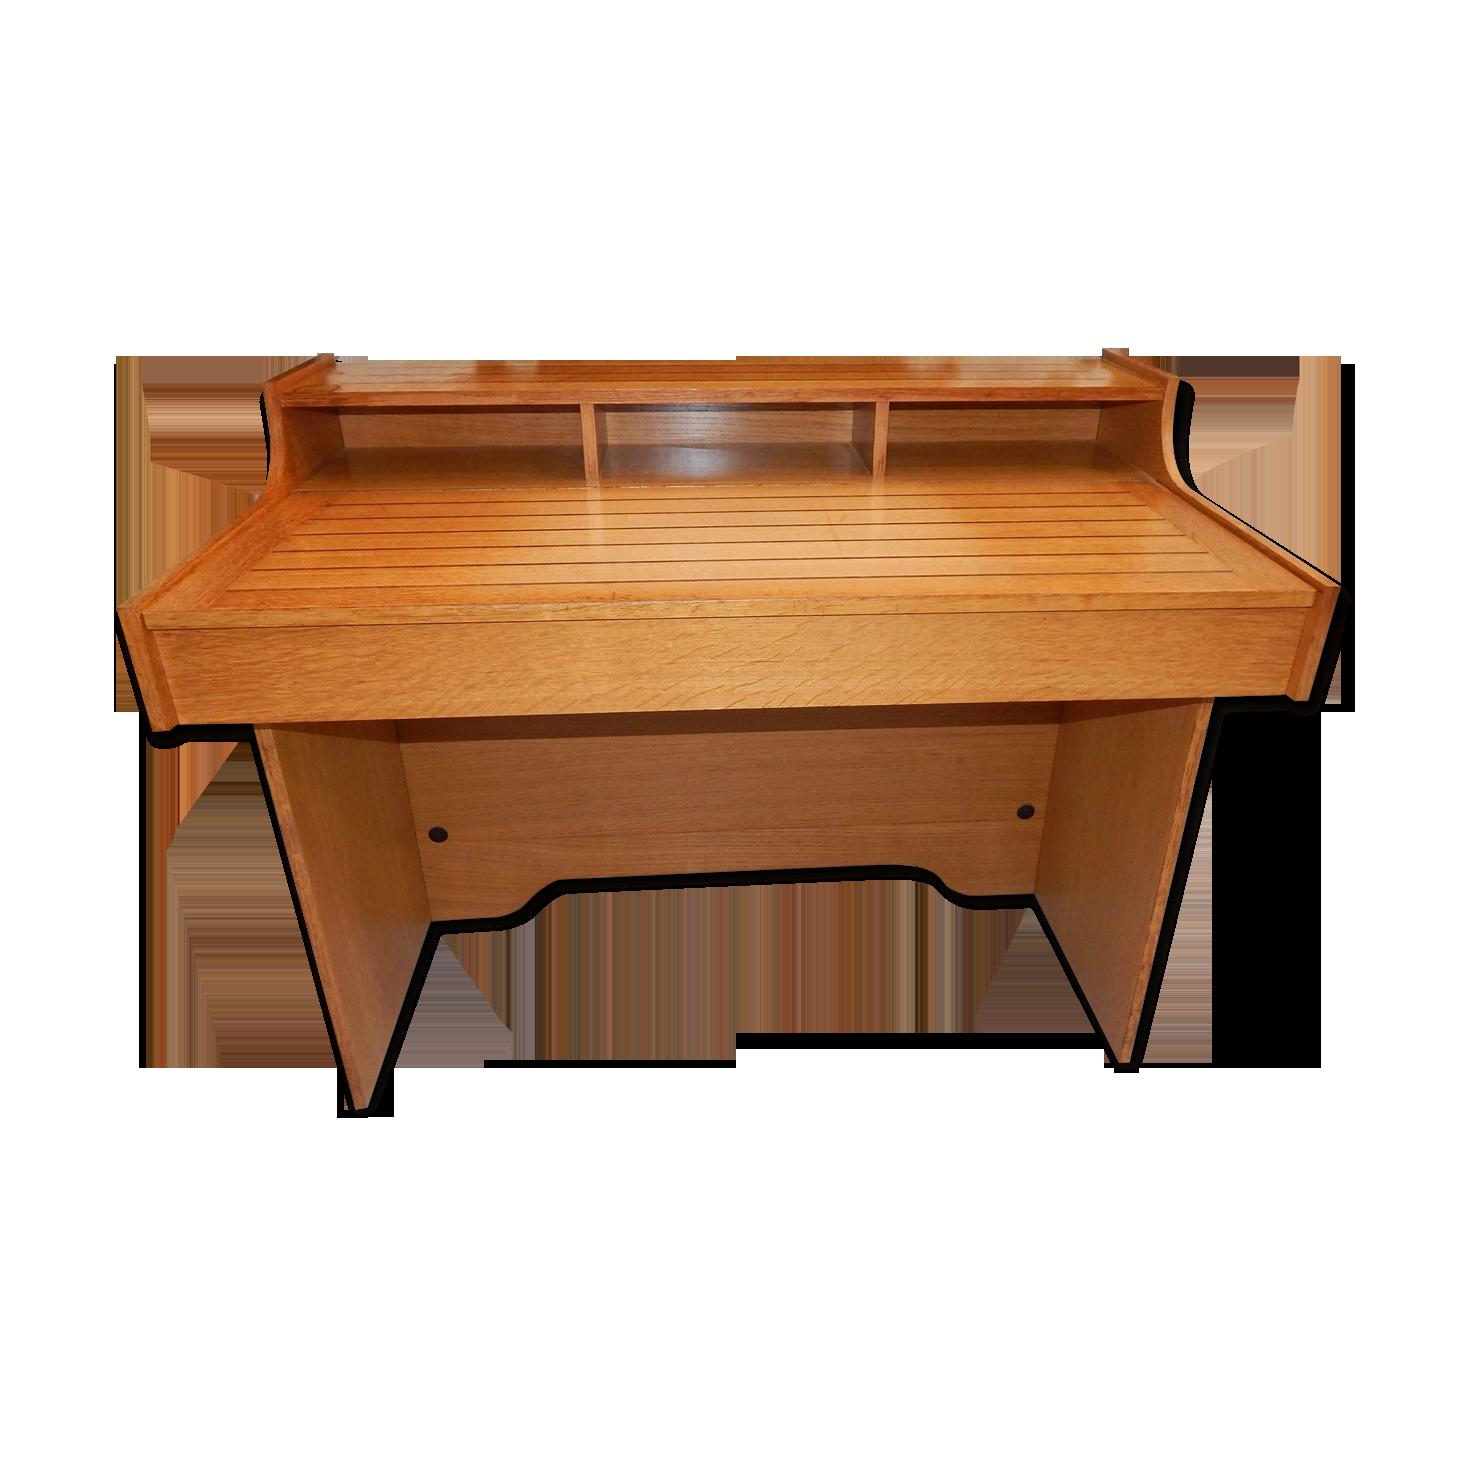 Bureau design gautier année bois matériau marron